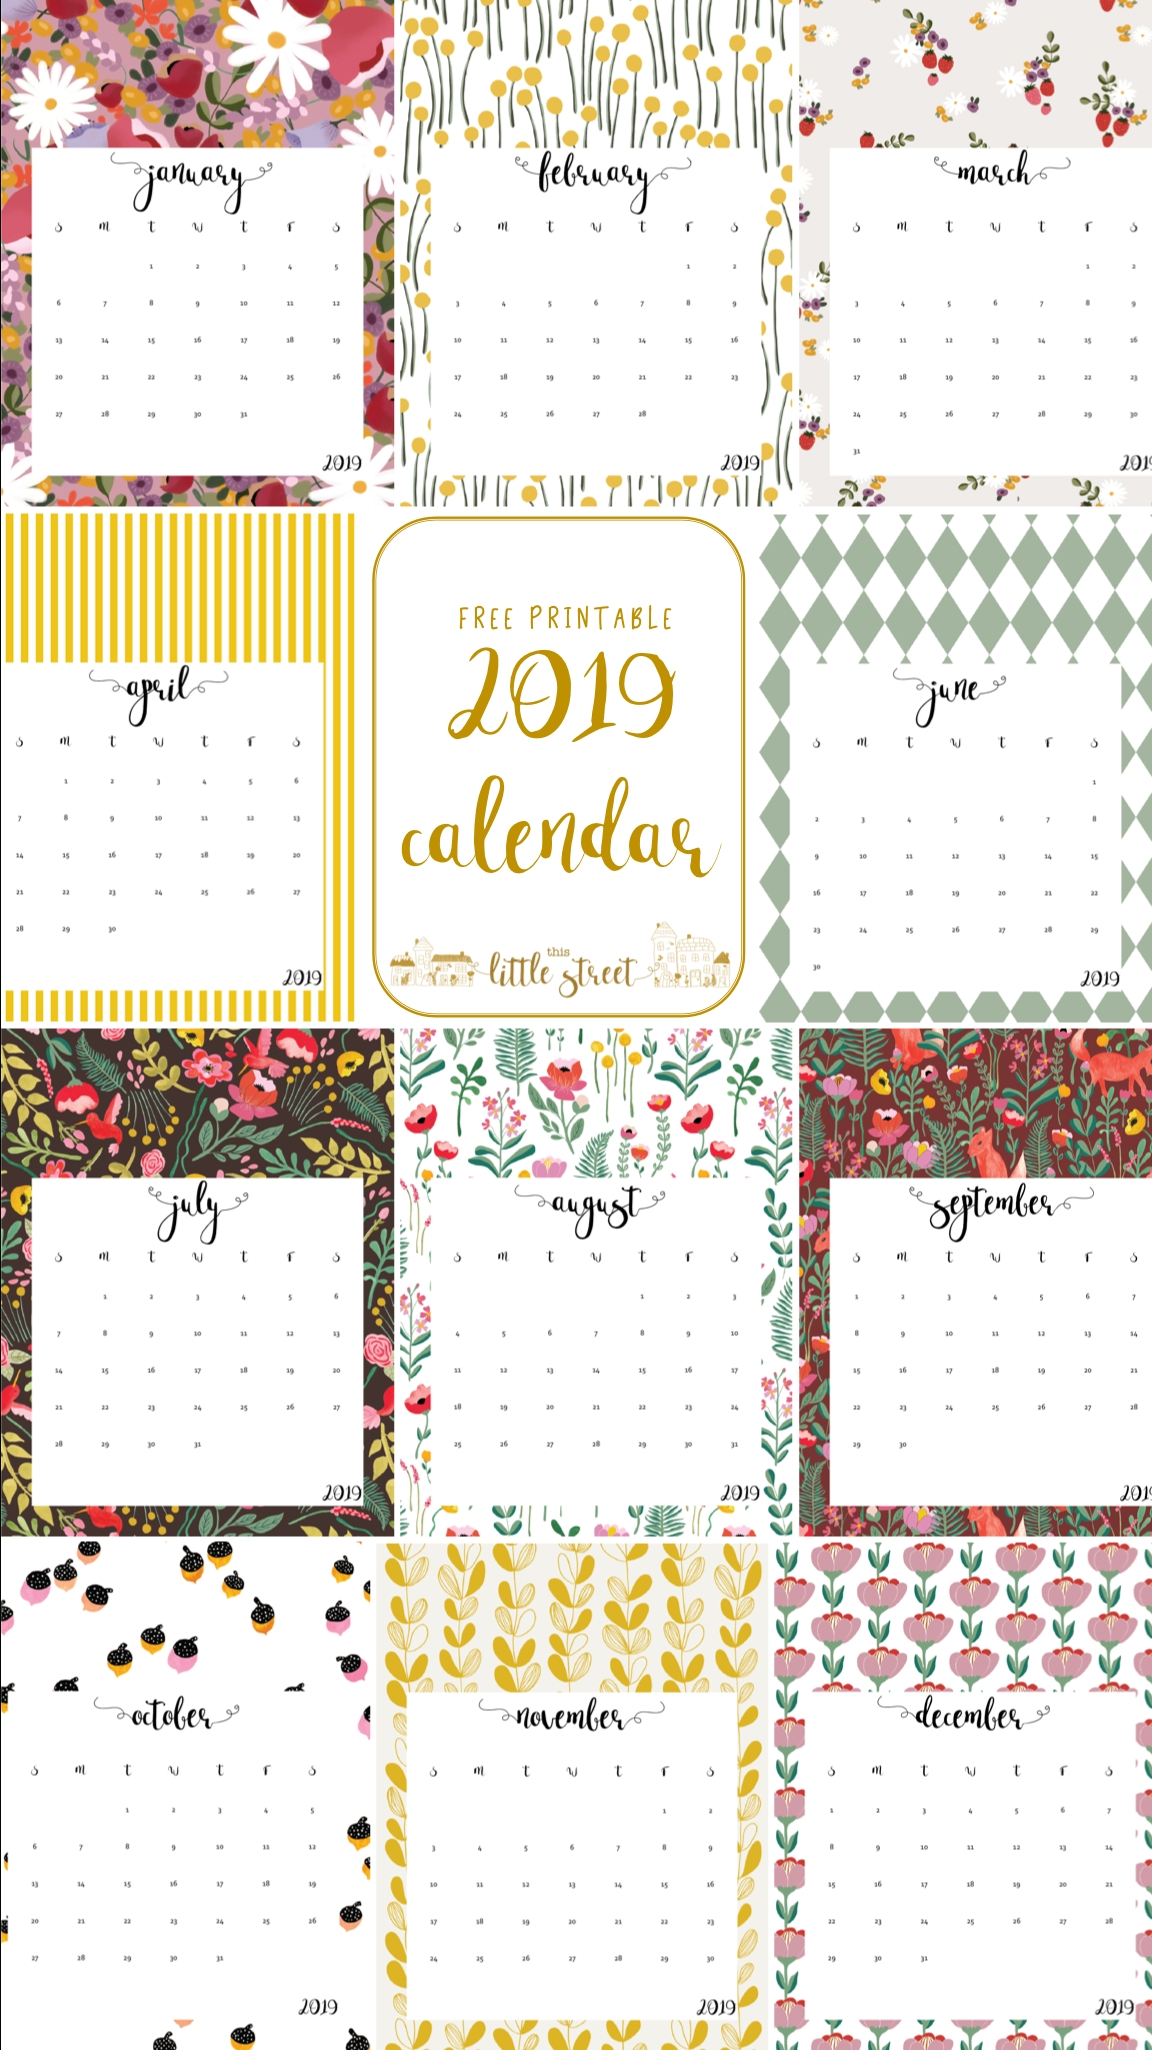 Free Printable 2019 Calendar.   Calendars   Free Printable-Free Printable 4X6 Calendars 2020 Templates